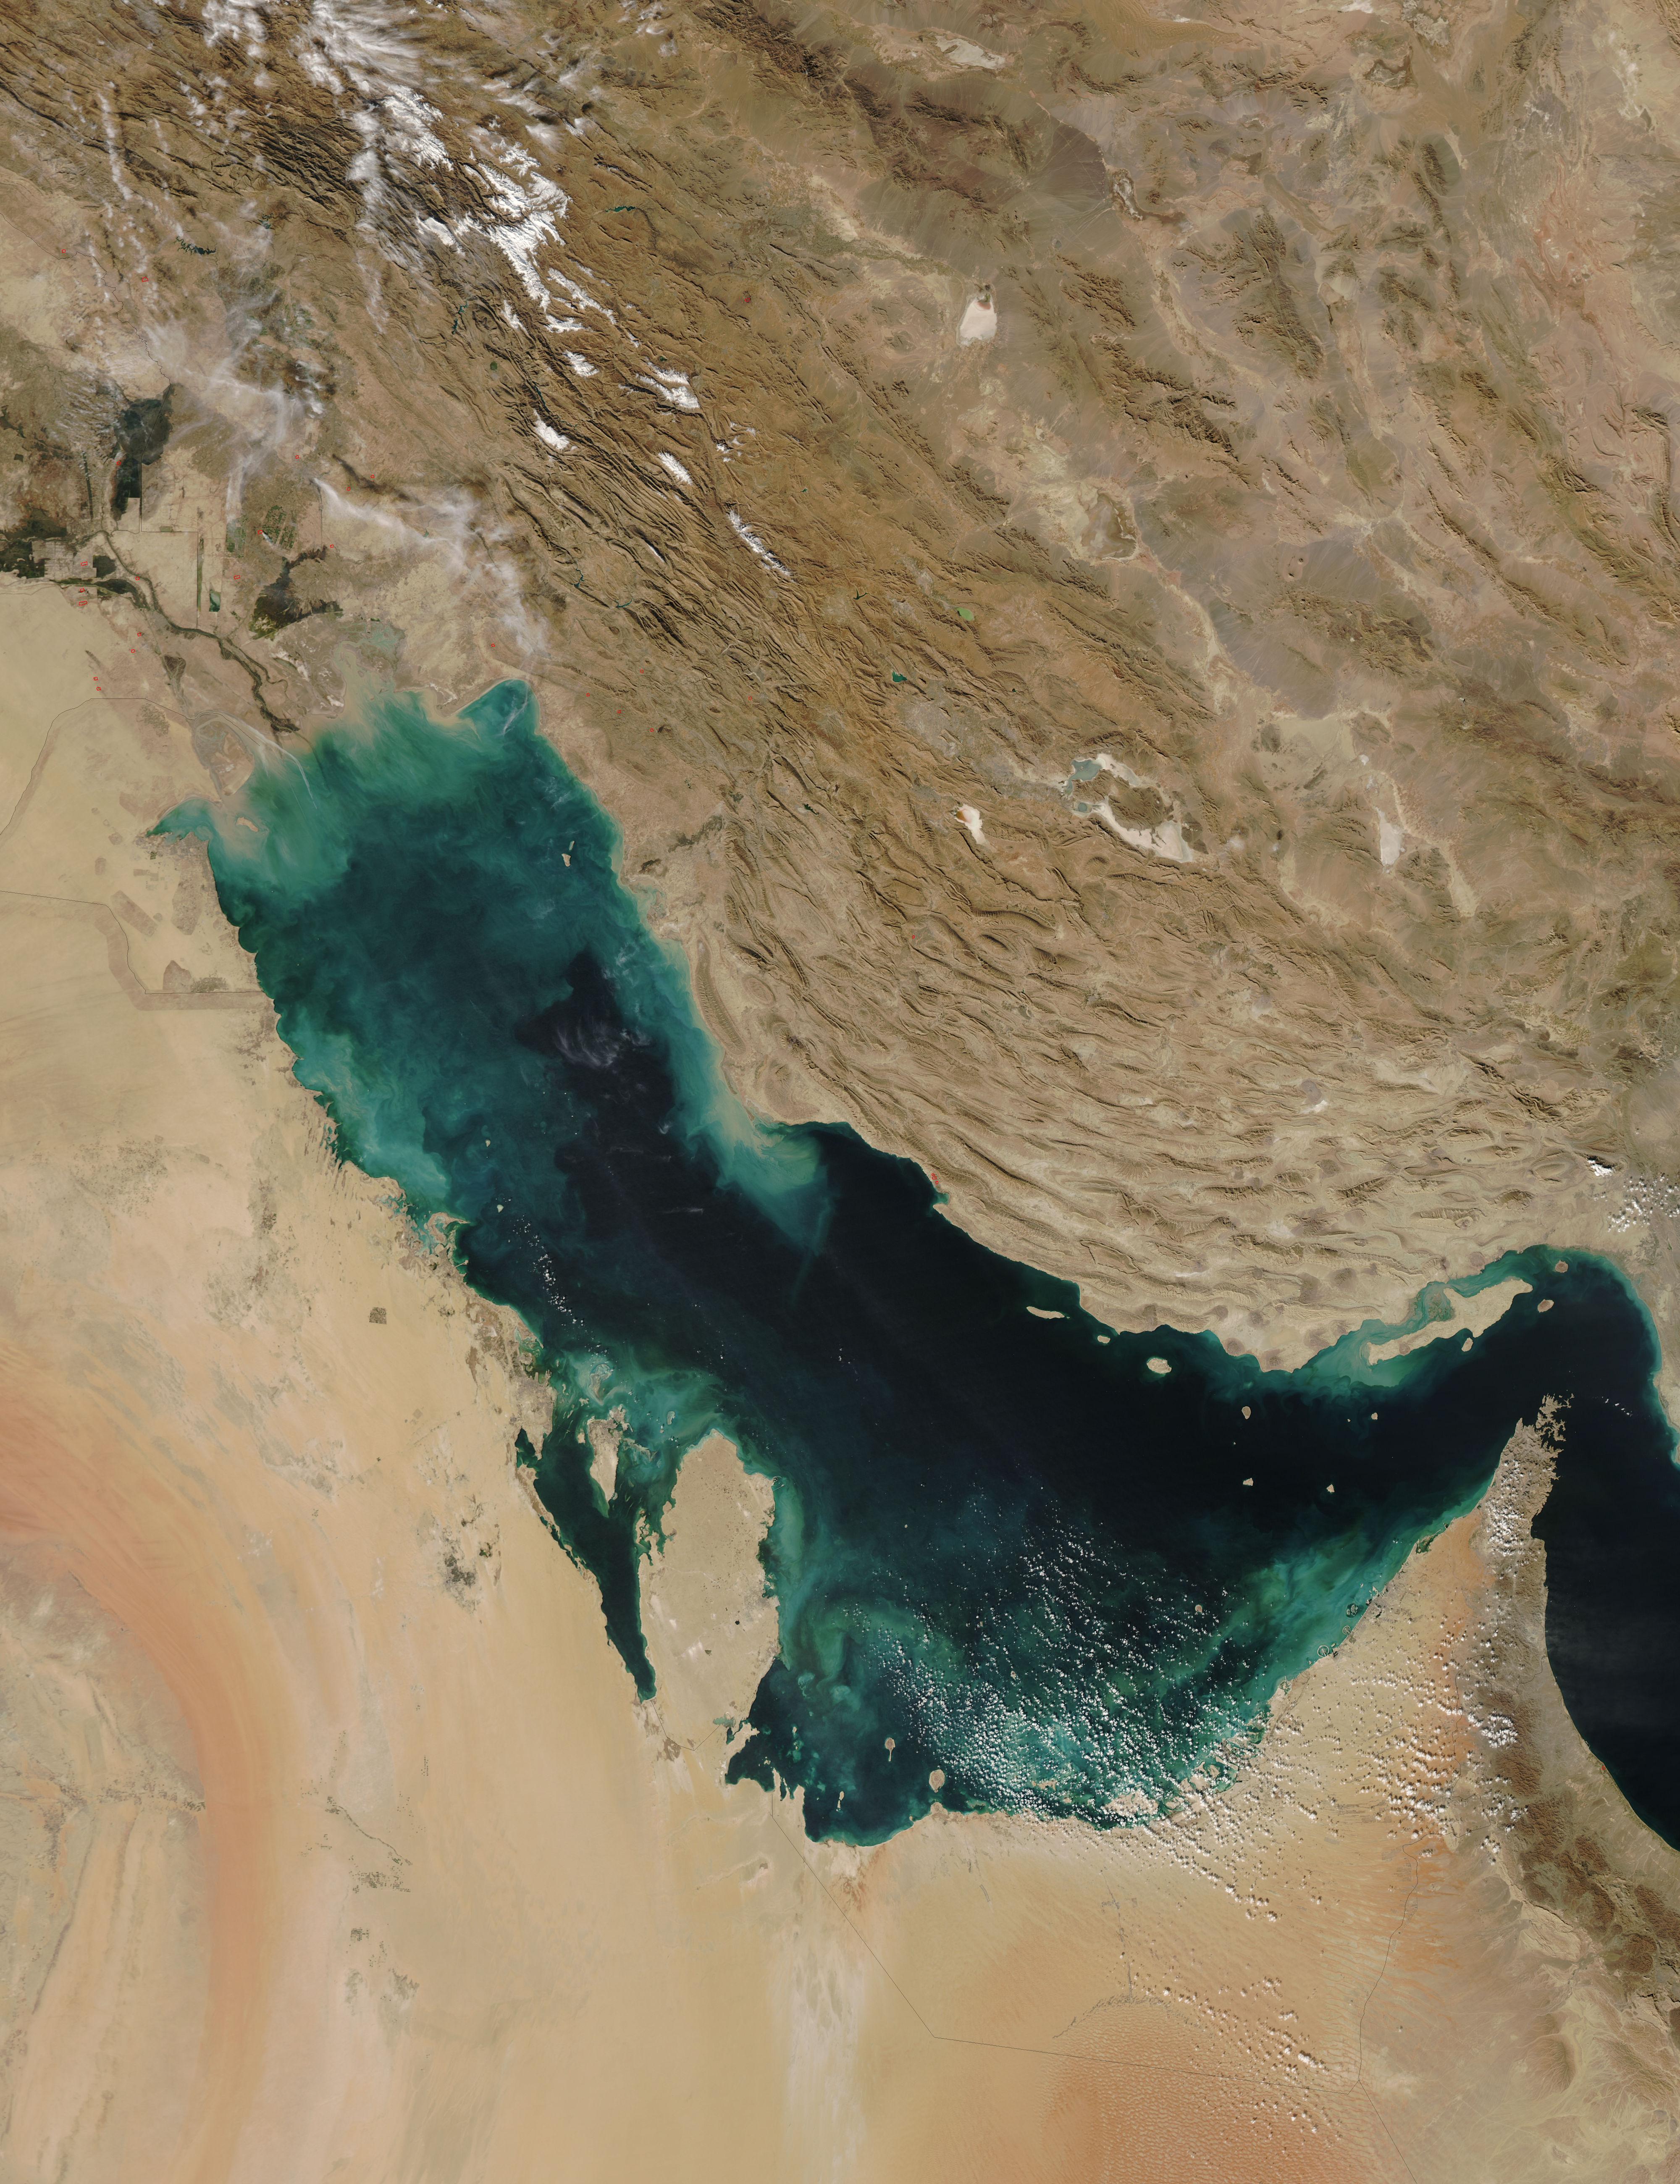 http://upload.wikimedia.org/wikipedia/commons/b/be/PersianGulf_vue_satellite_du_golfe_persique.jpg